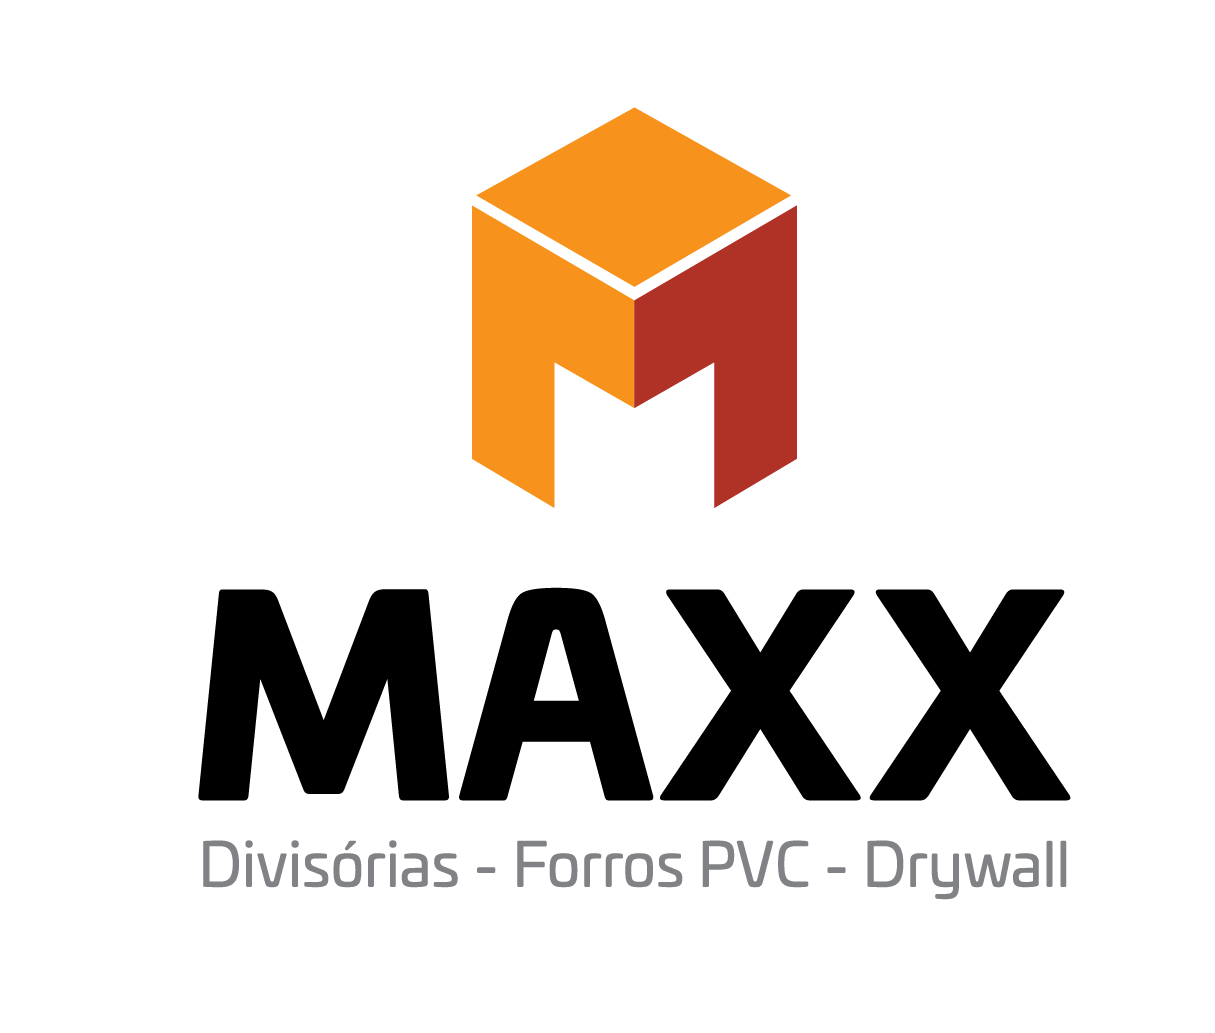 Comprar Forro de Pvc Colocado Parque Santa Madalena - Forro de Pvc com Isolamento Térmico - Maxx Forro